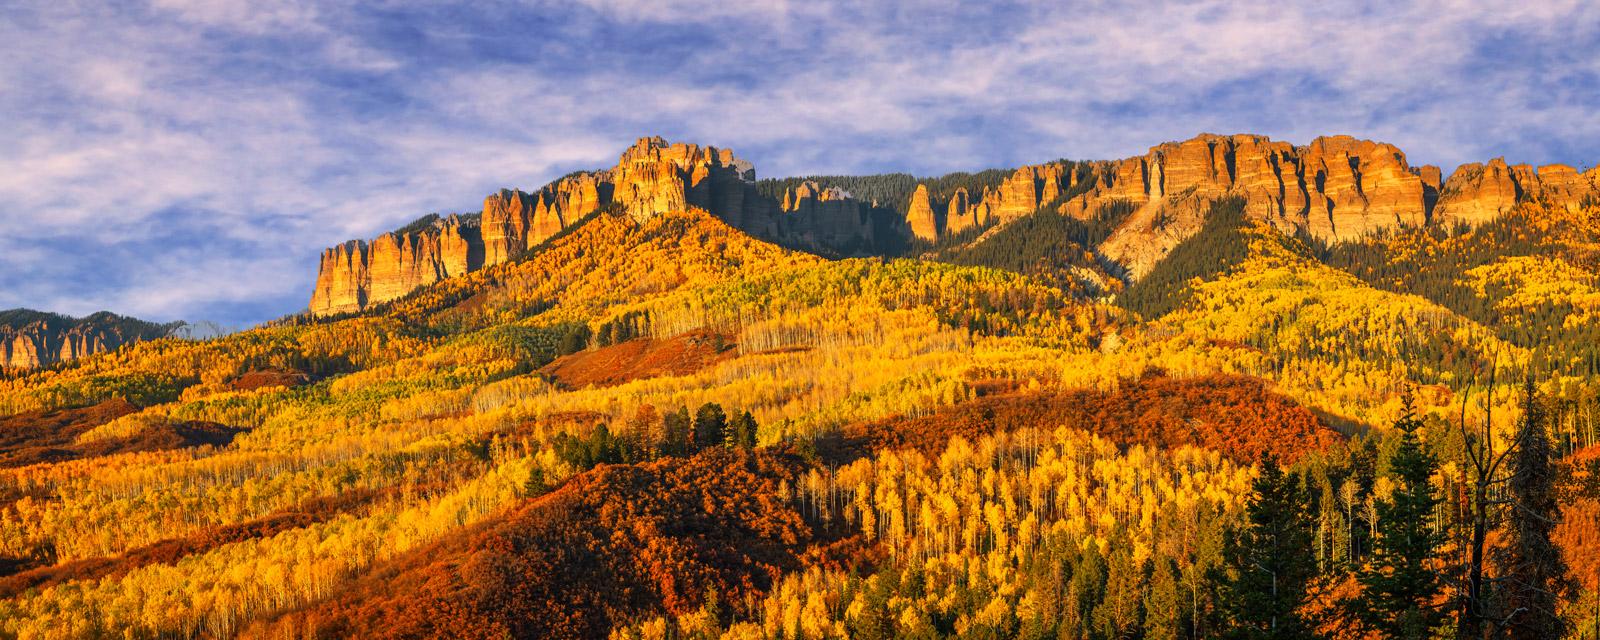 Colorado, Southwest Colorado, Landscape, Photograph, Cimarron Ridge, San Juan Mountains, Fine Art, Fine Art Print, Metal Print, Acrylic Print, Fall Color, photo, photo